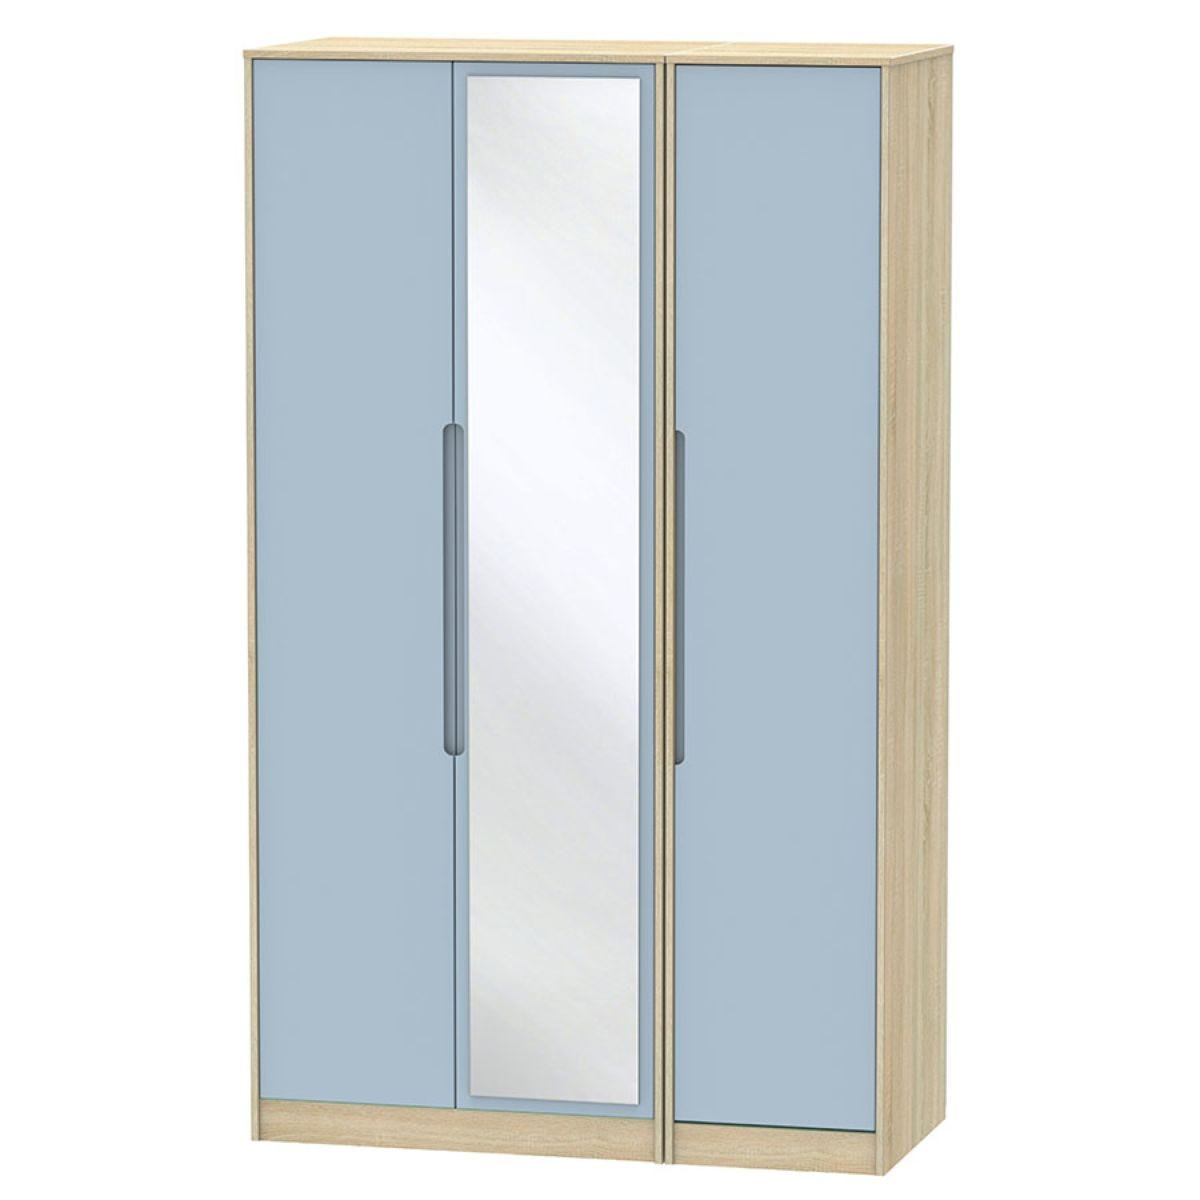 Barquero Tall 3-Door Mirrored Wardrobe- Pine/Denim